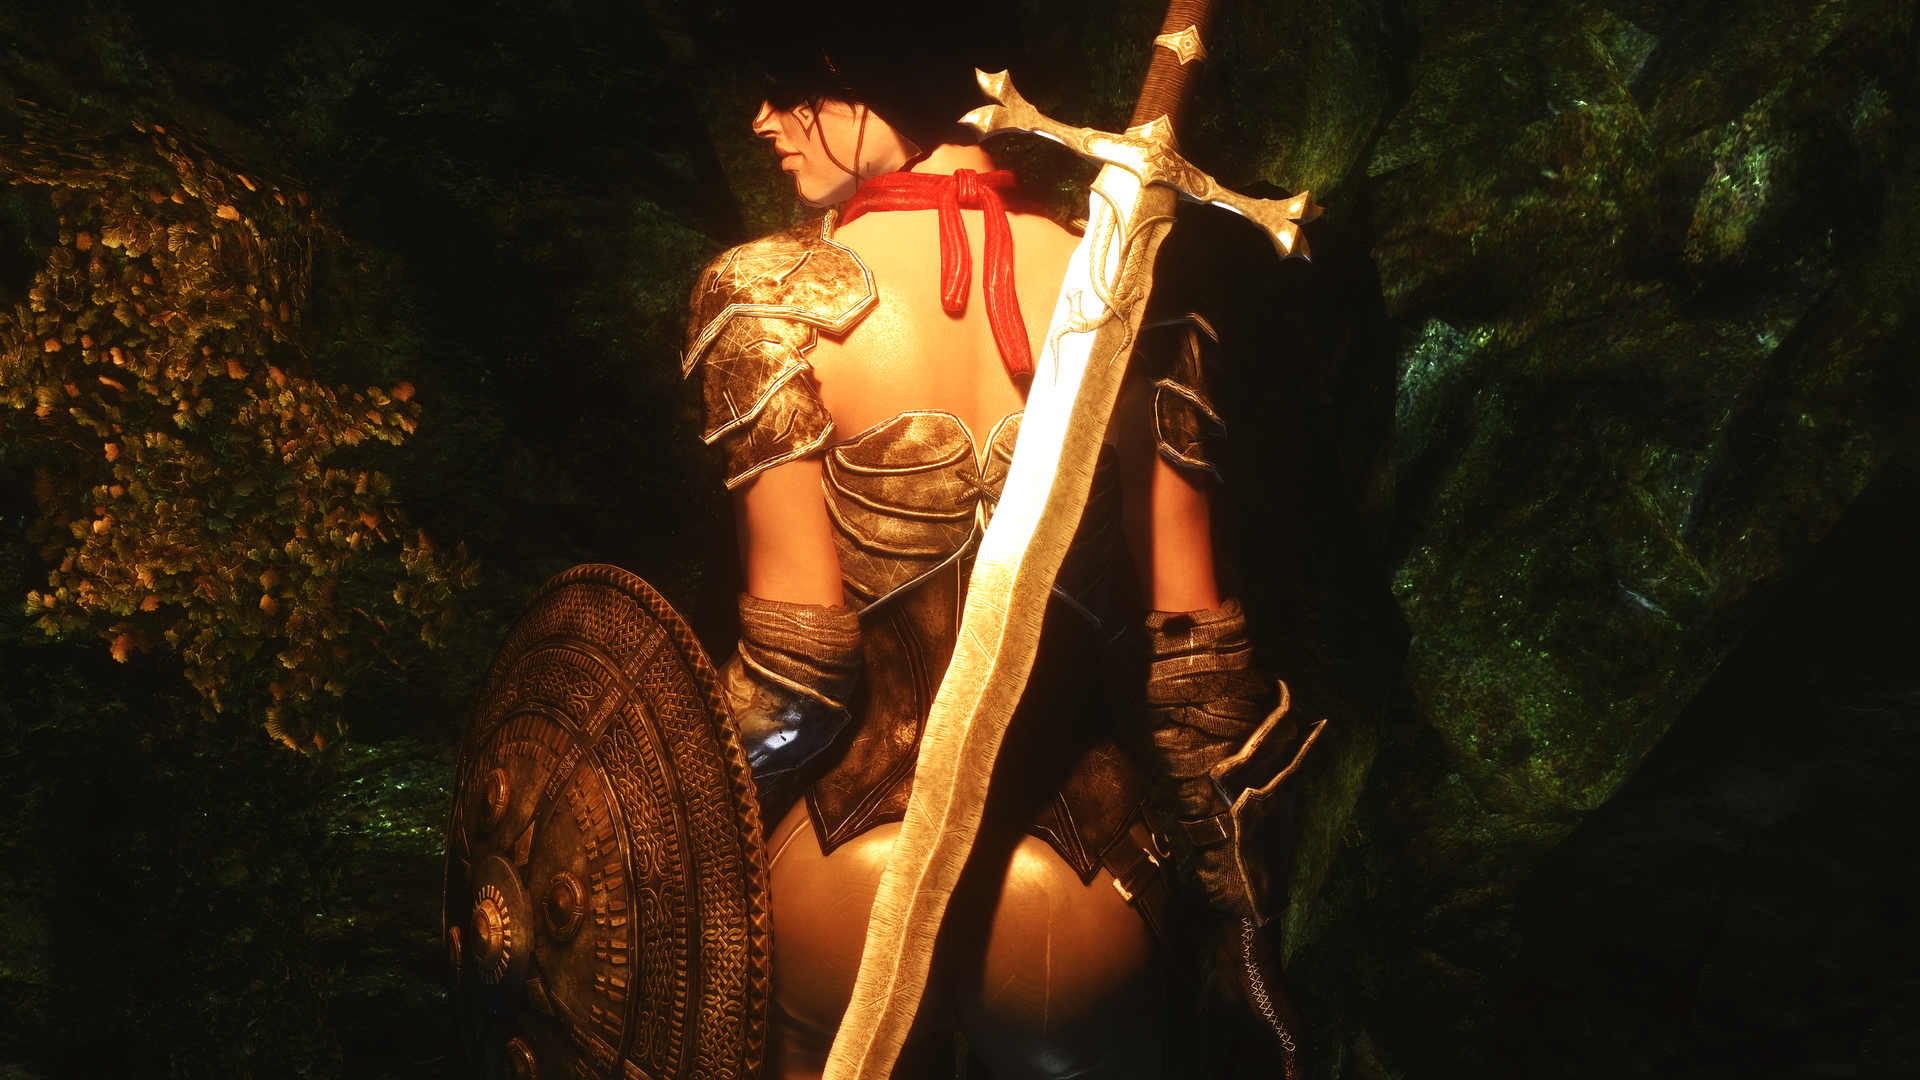 the elder scrolls v skyrim girl sword weapon background warrior ...